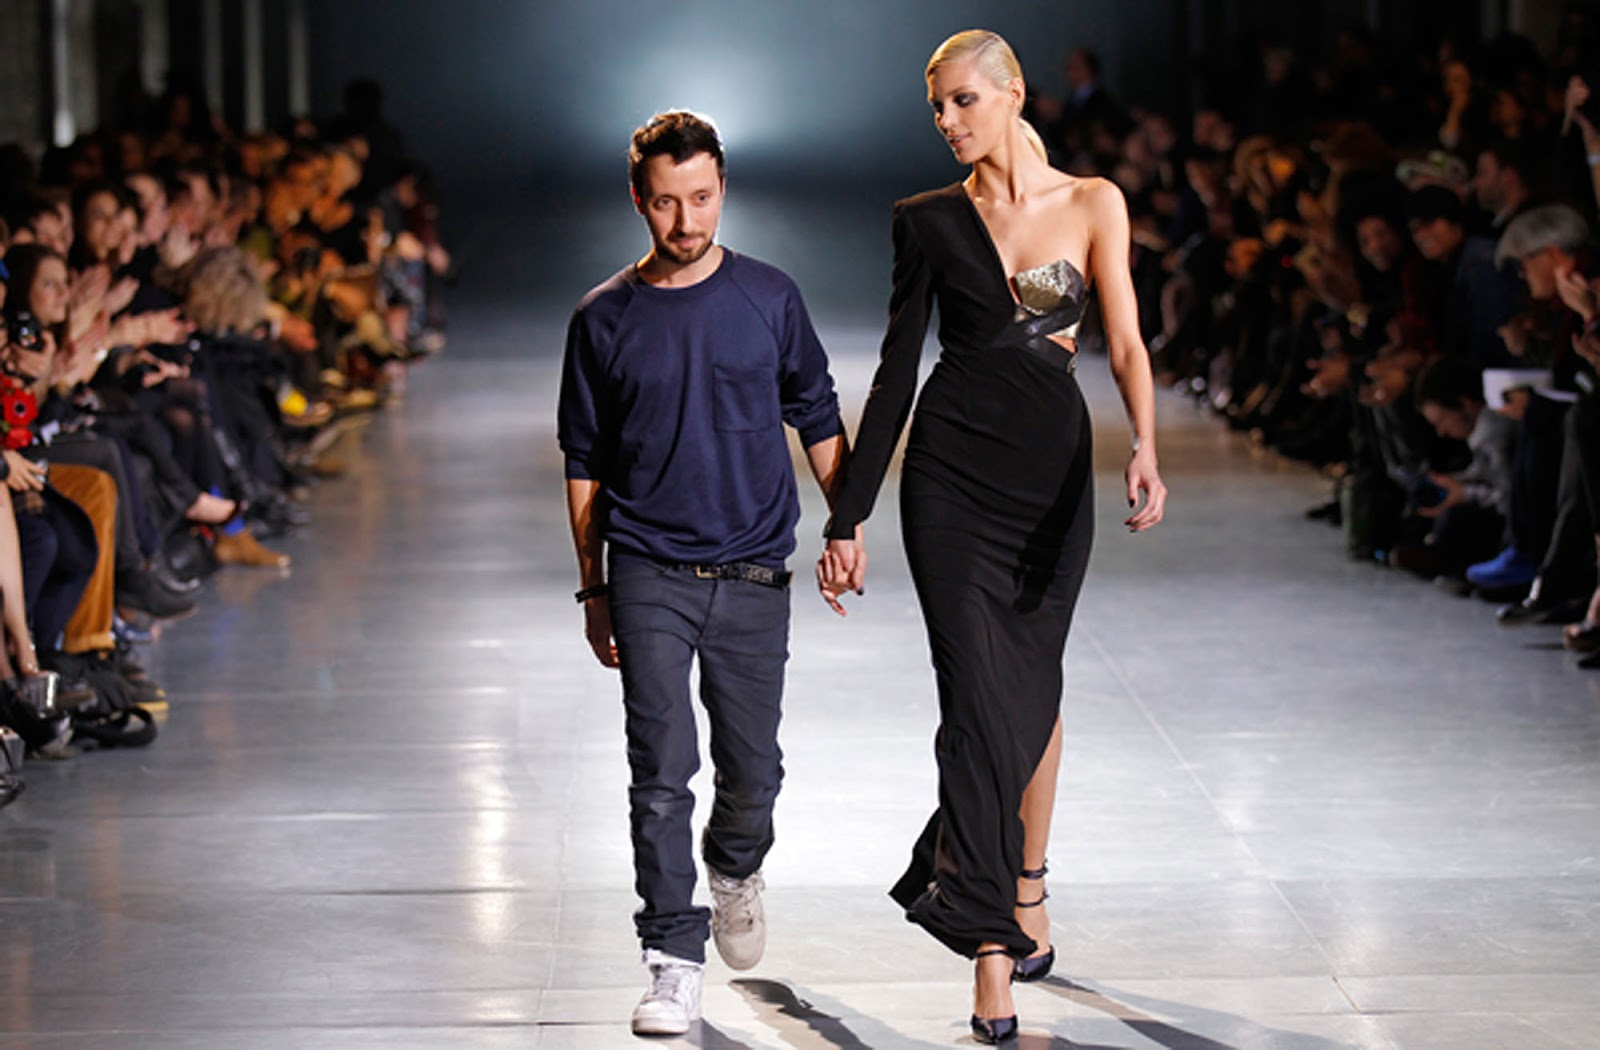 Eniwhere Fashion - Anthony Vaccarello